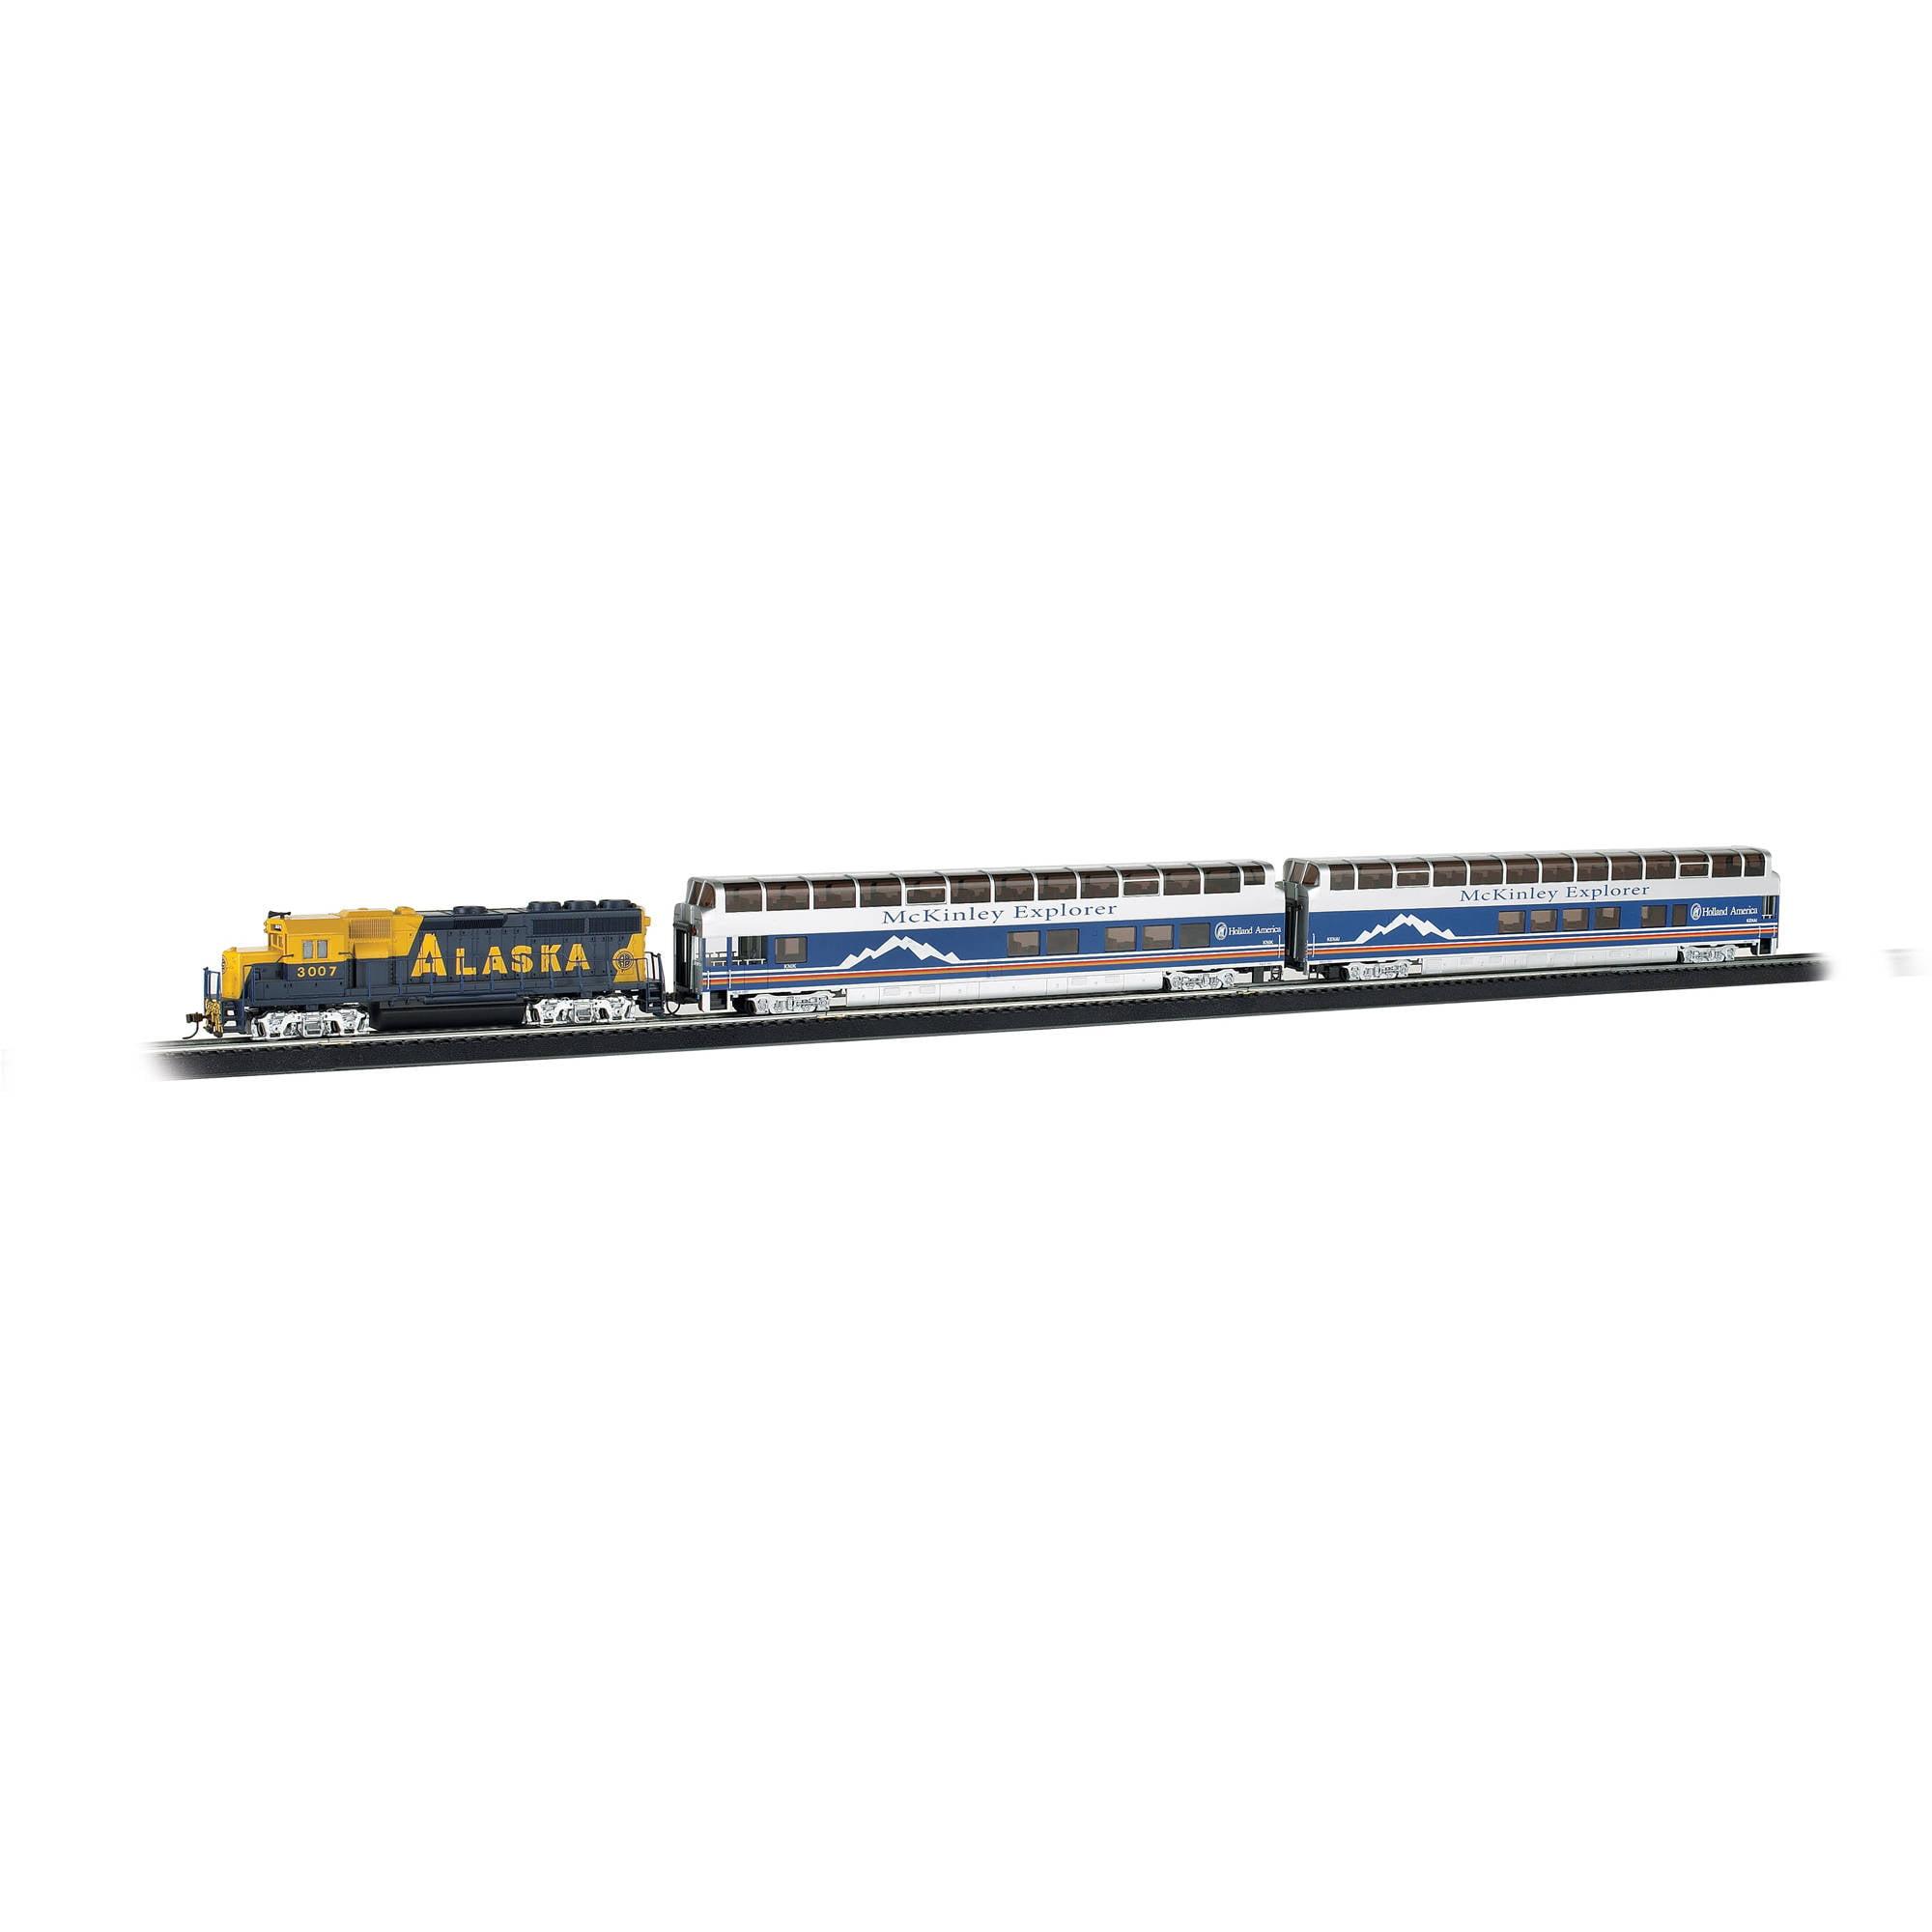 Bachmann Trains Mckinley Explorer HO Scale Ready-To-Run Electric Train Set by Bachmann Trains